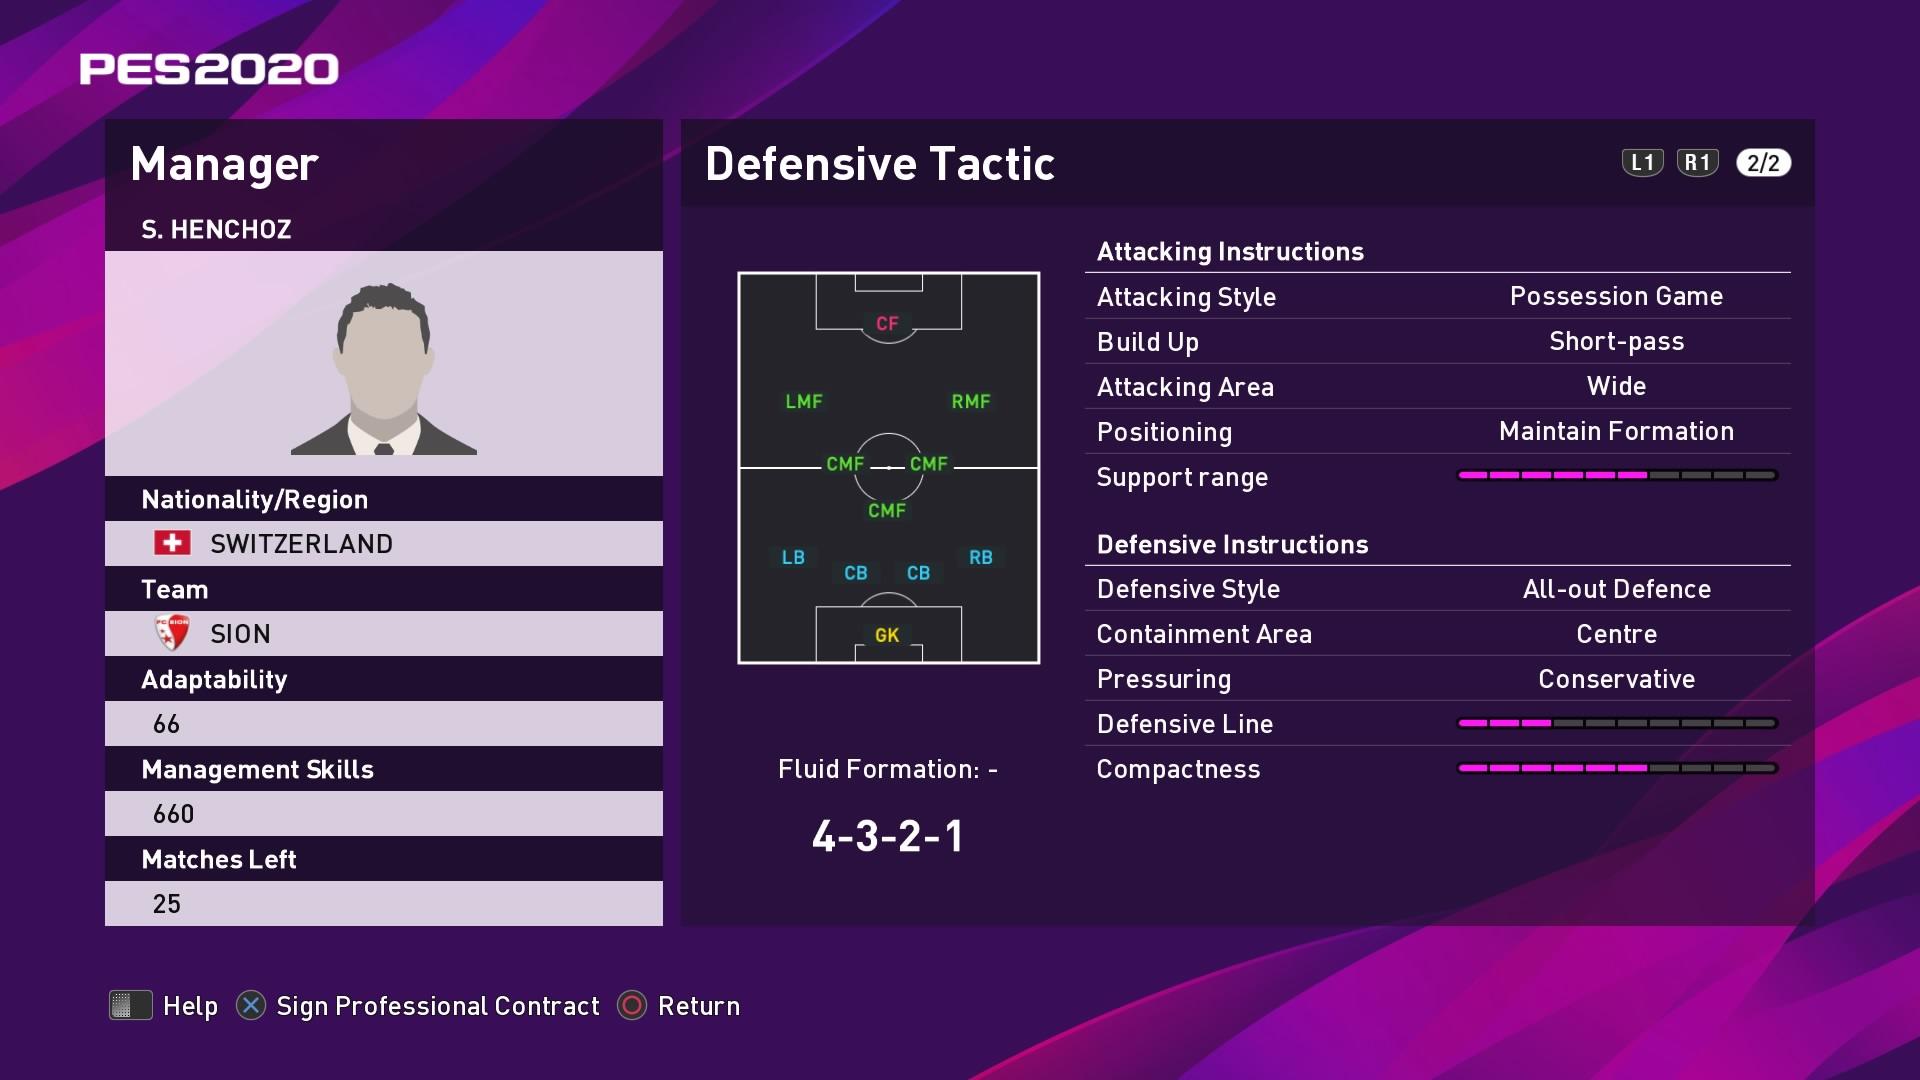 S. Henchoz (Stéphane Henchoz) Defensive Tactic in PES 2020 myClub